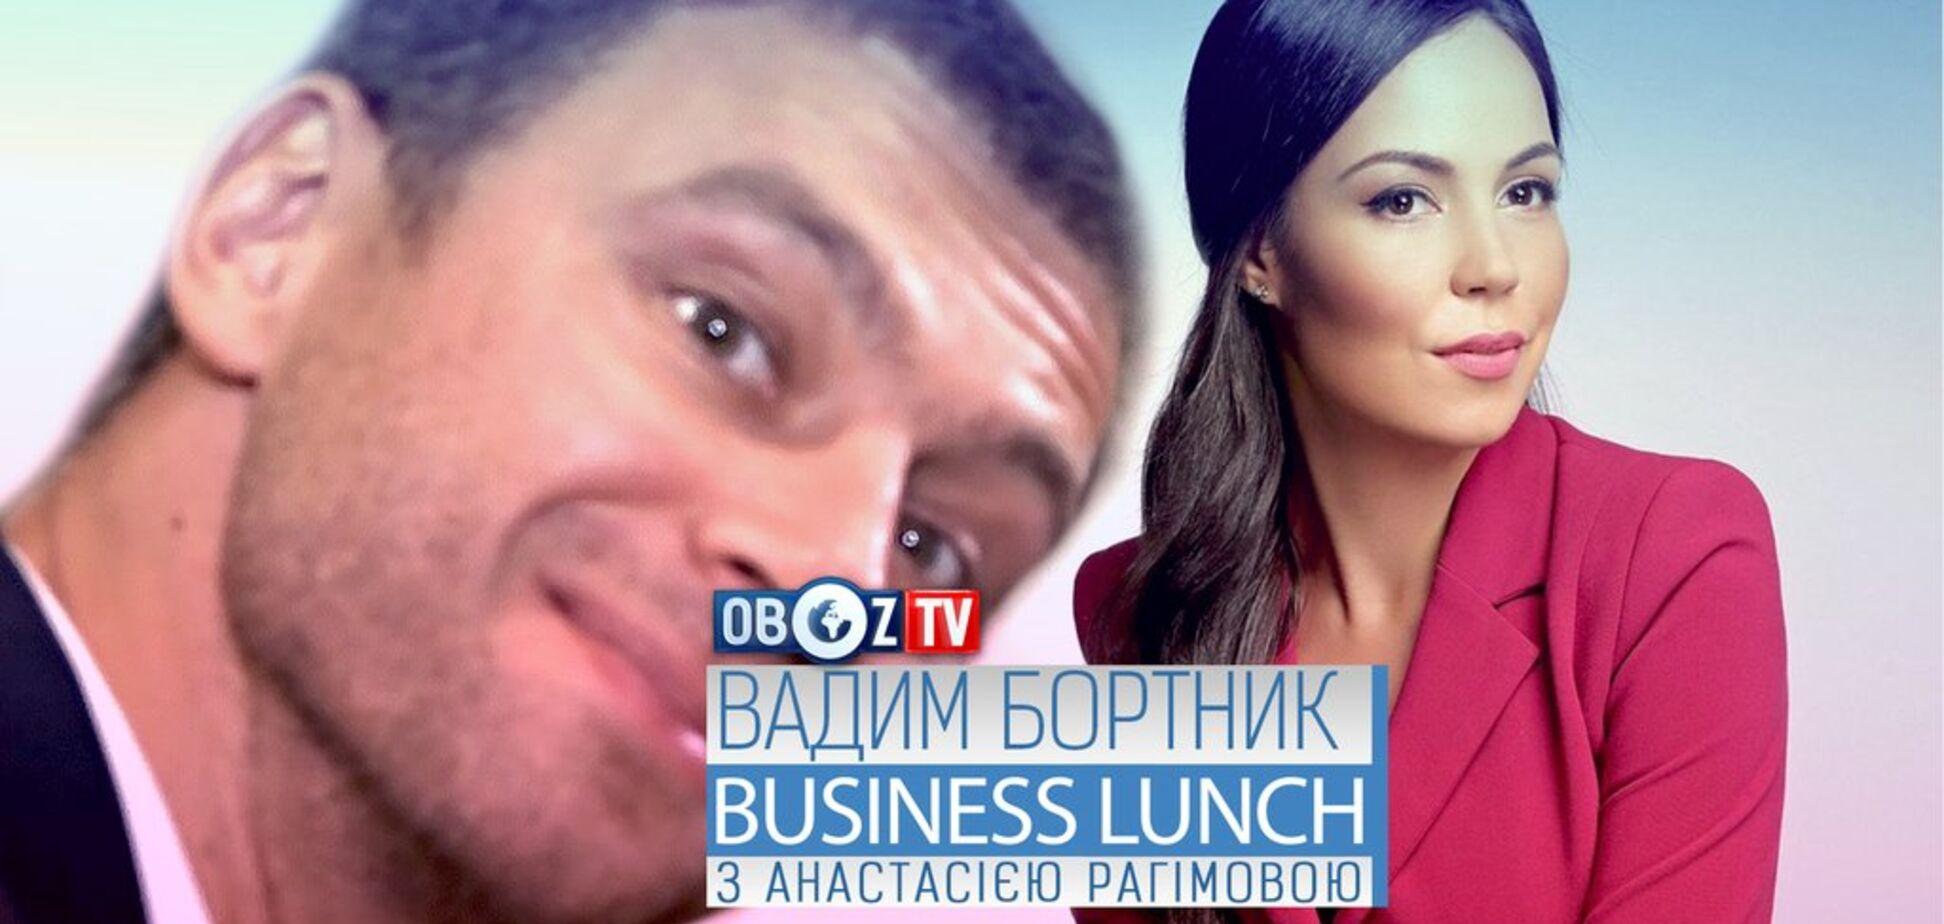 Вадим Бортник | Business Lunch з Анастасією Рагімовою